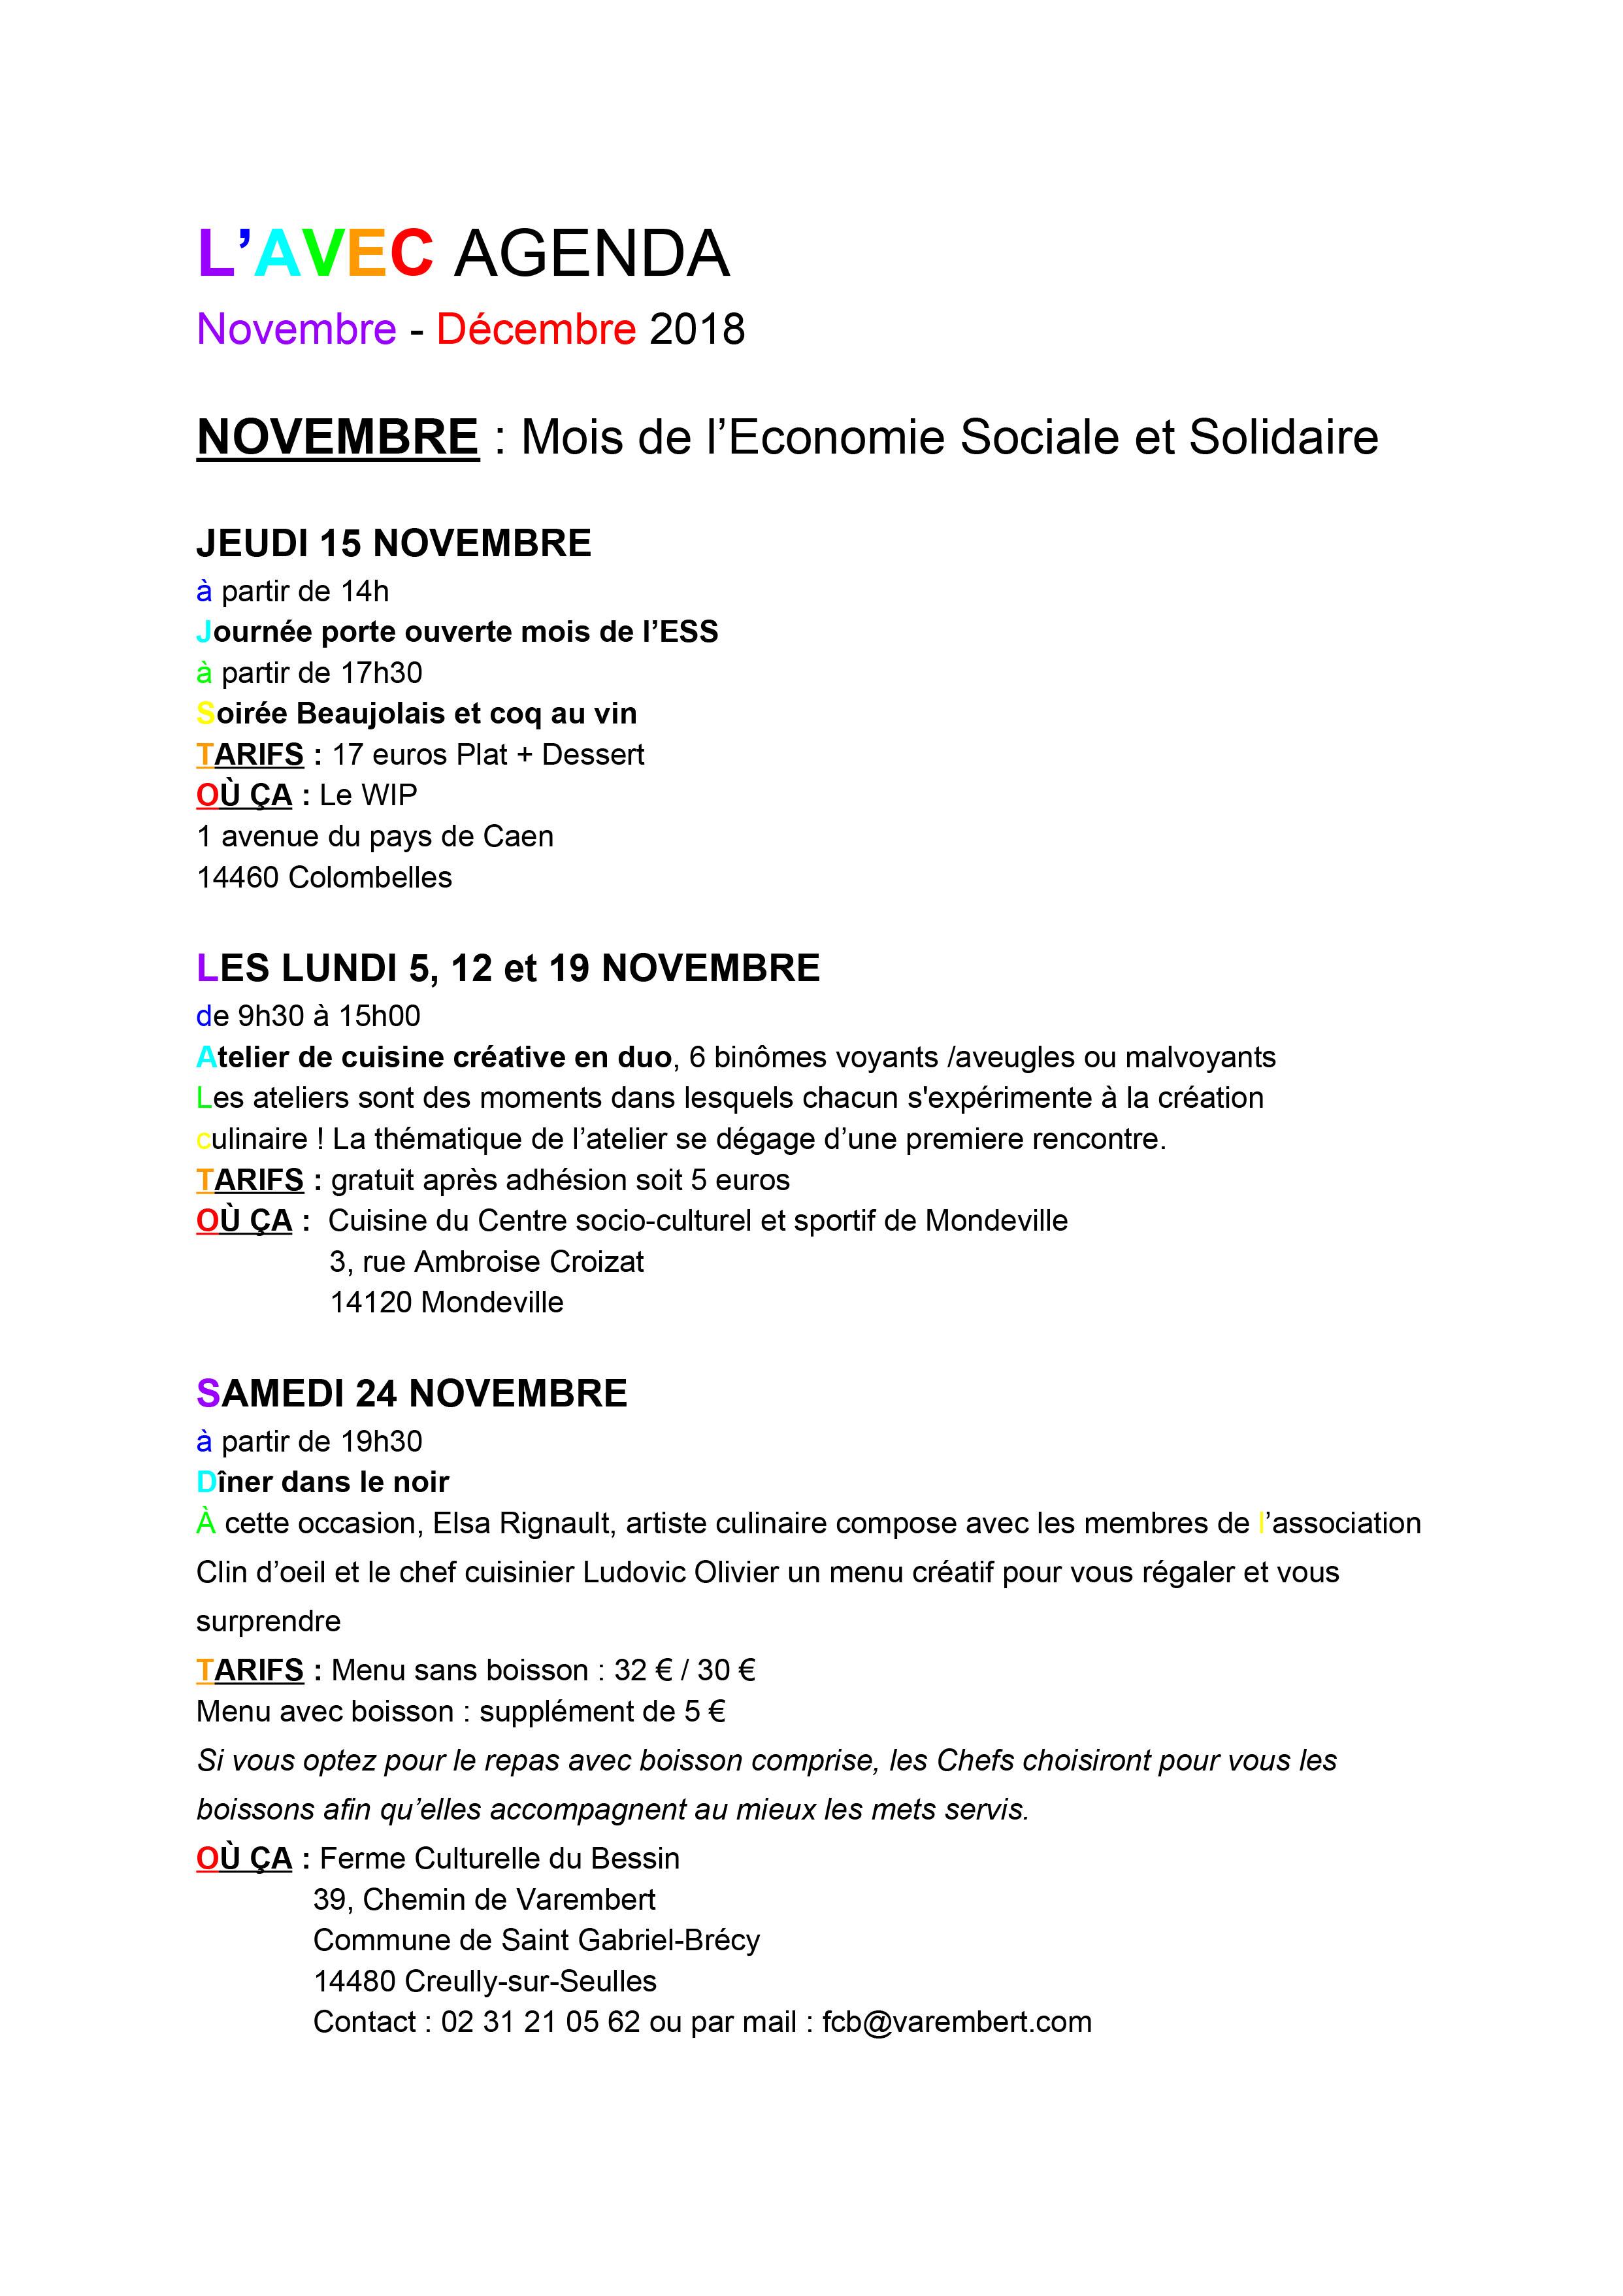 AGENDA Nov-Dec 2018-1.jpg